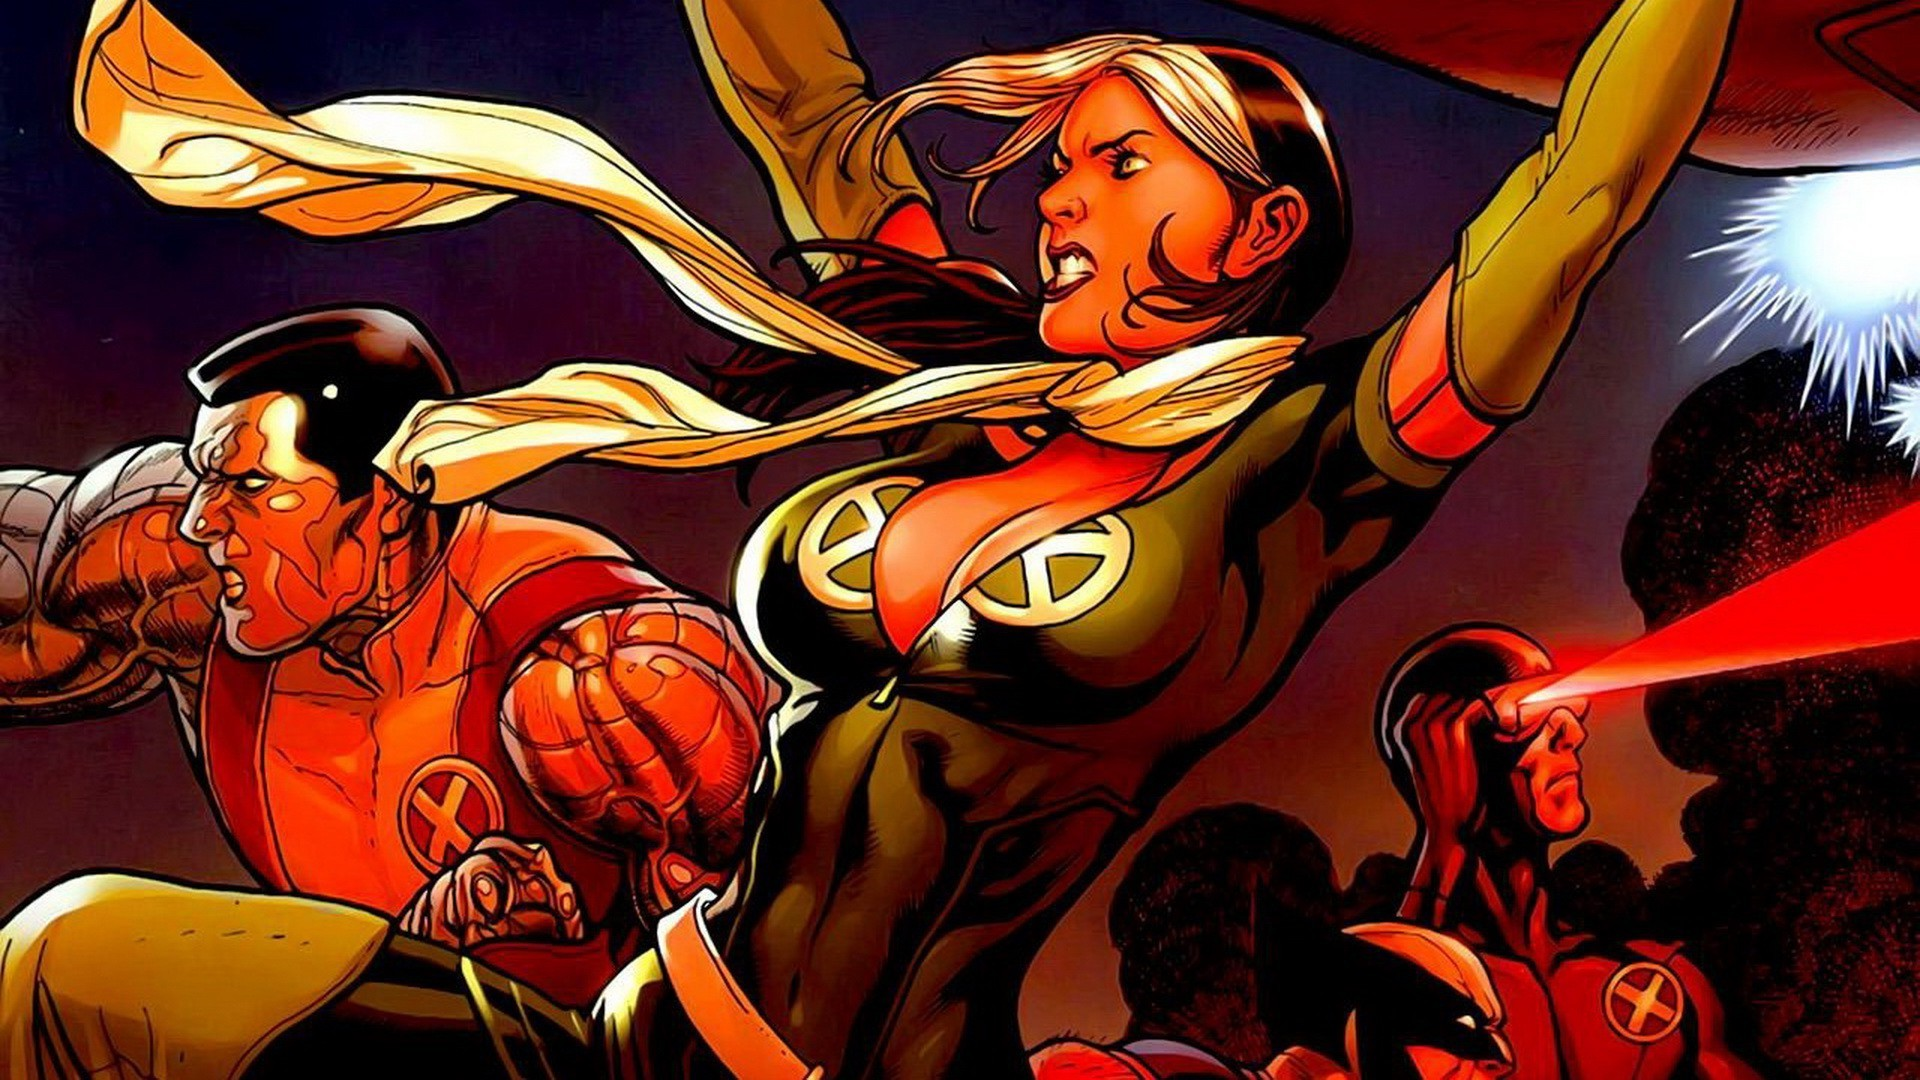 comics, Wolverine, X Men, Cyclops, Marvel Comics, Rogue (character)  Wallpapers HD / Desktop and Mobile Backgrounds